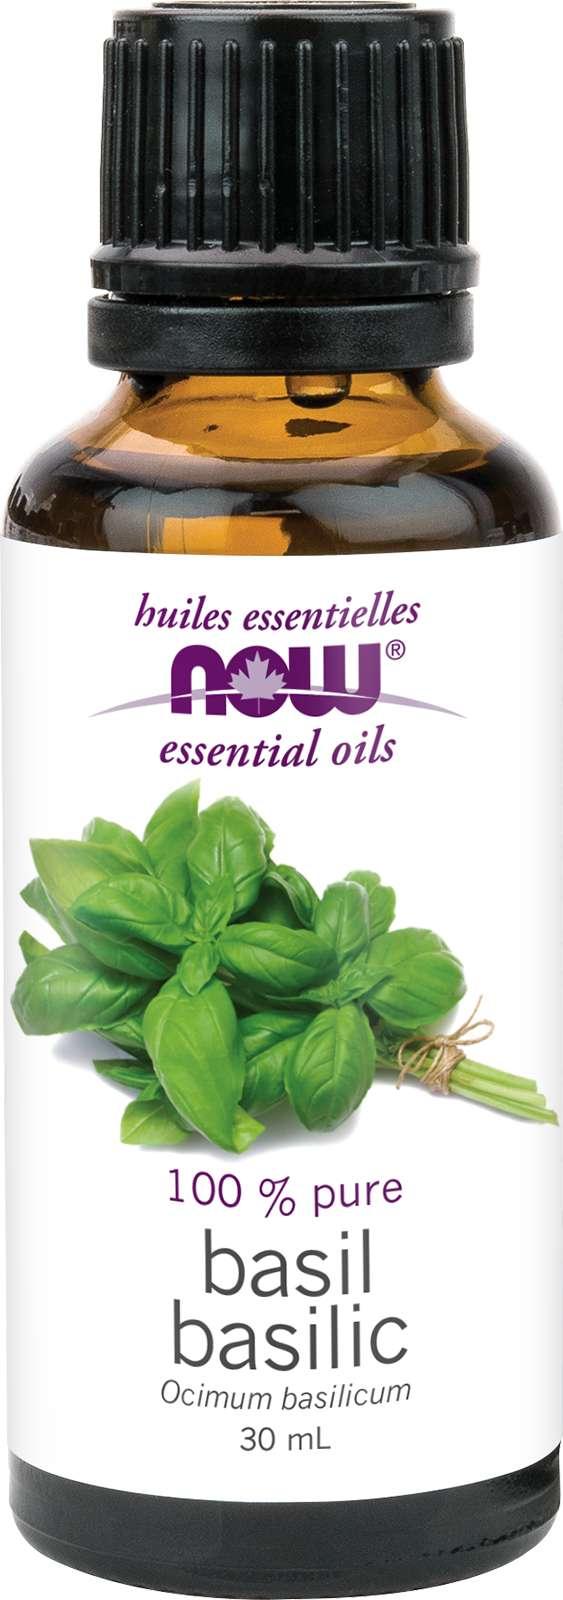 Basil Oil (Ocimum basilicum) 30mL